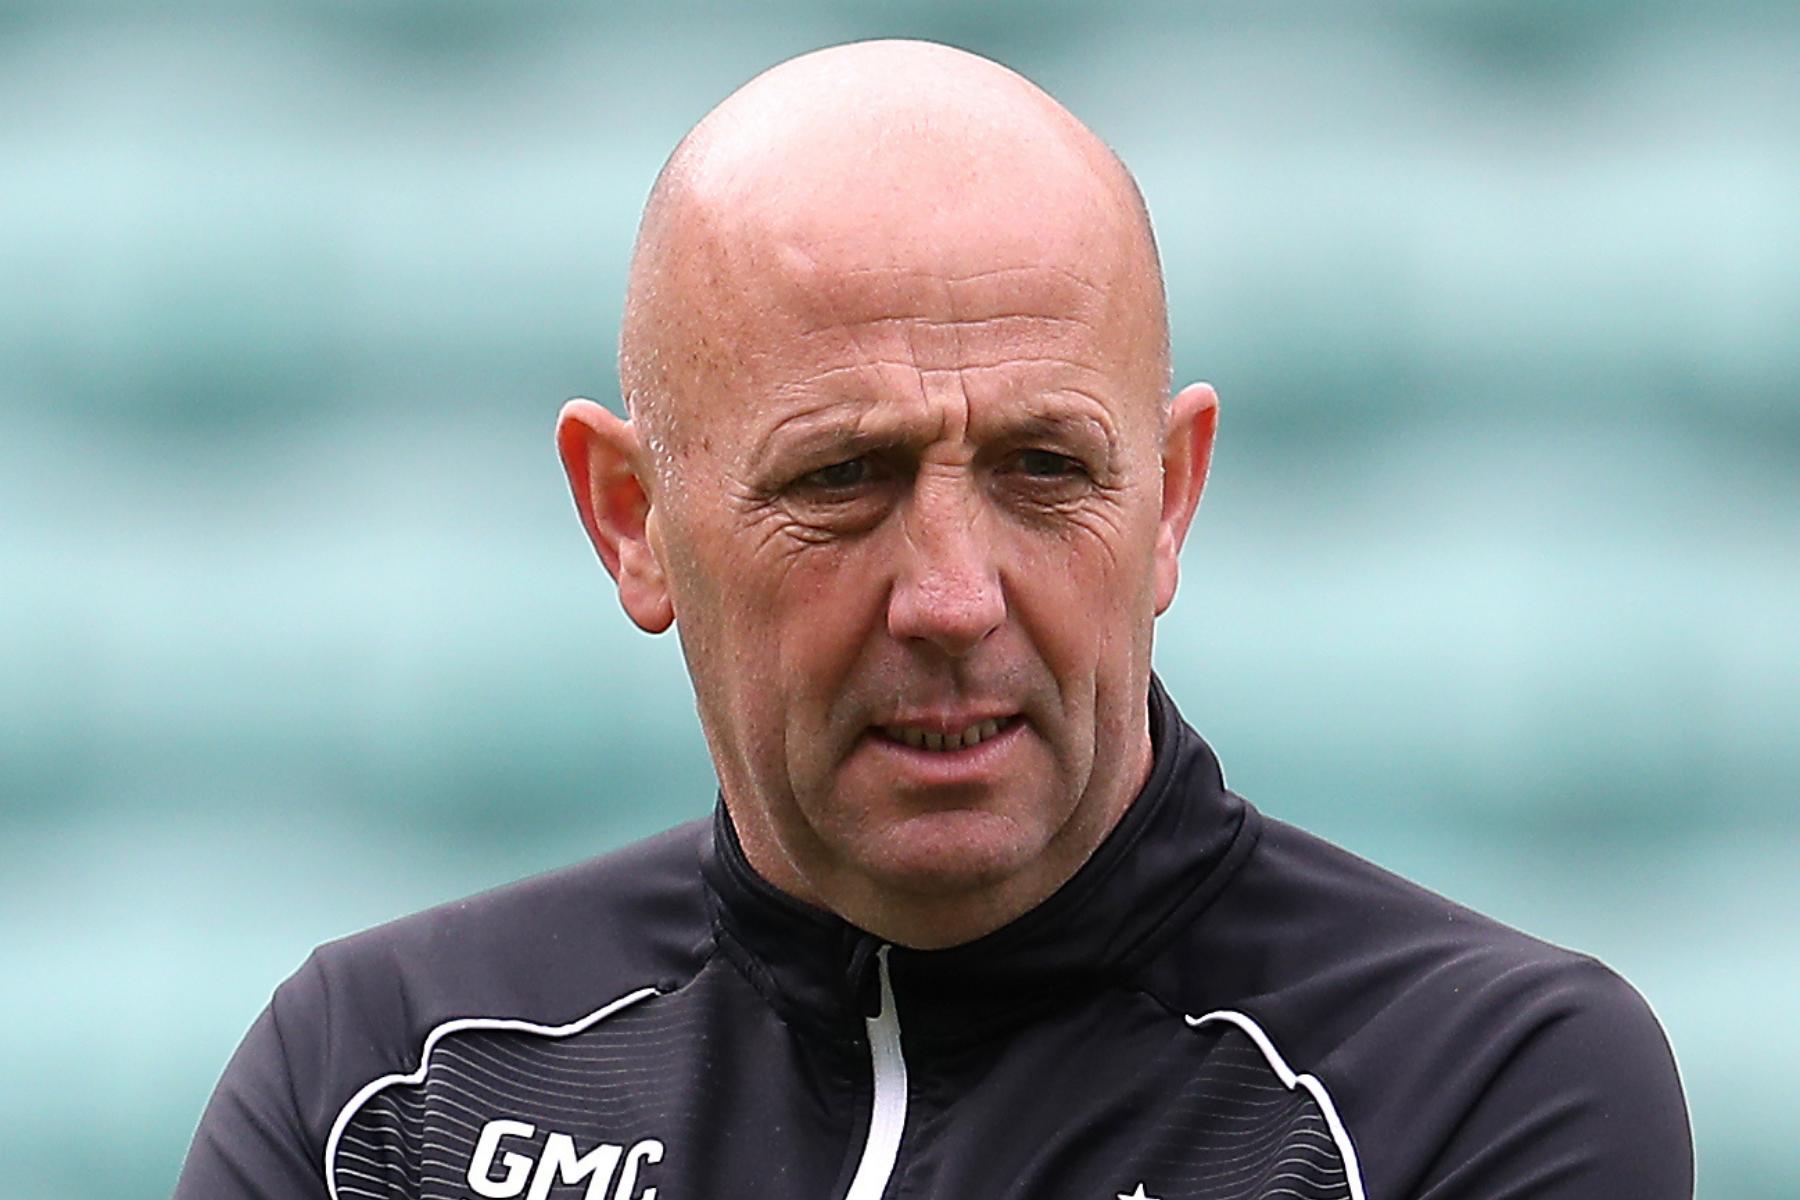 Rangers Covid outbreak: McAllister hopeful isolating stars could return for Celtic match